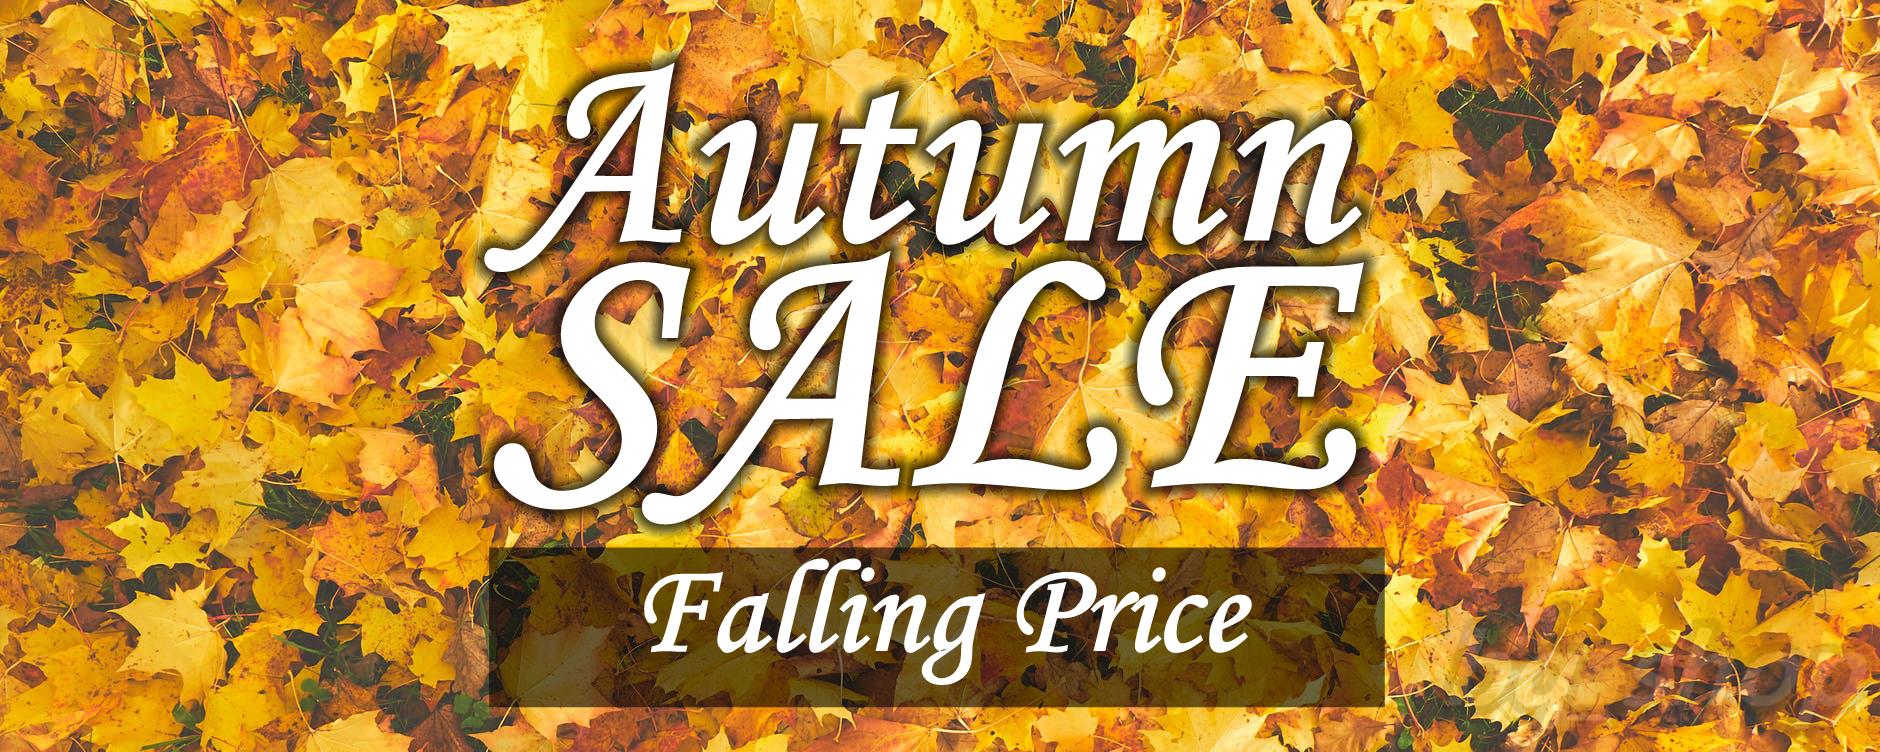 autumnsale2018-bqshopestore.com.png